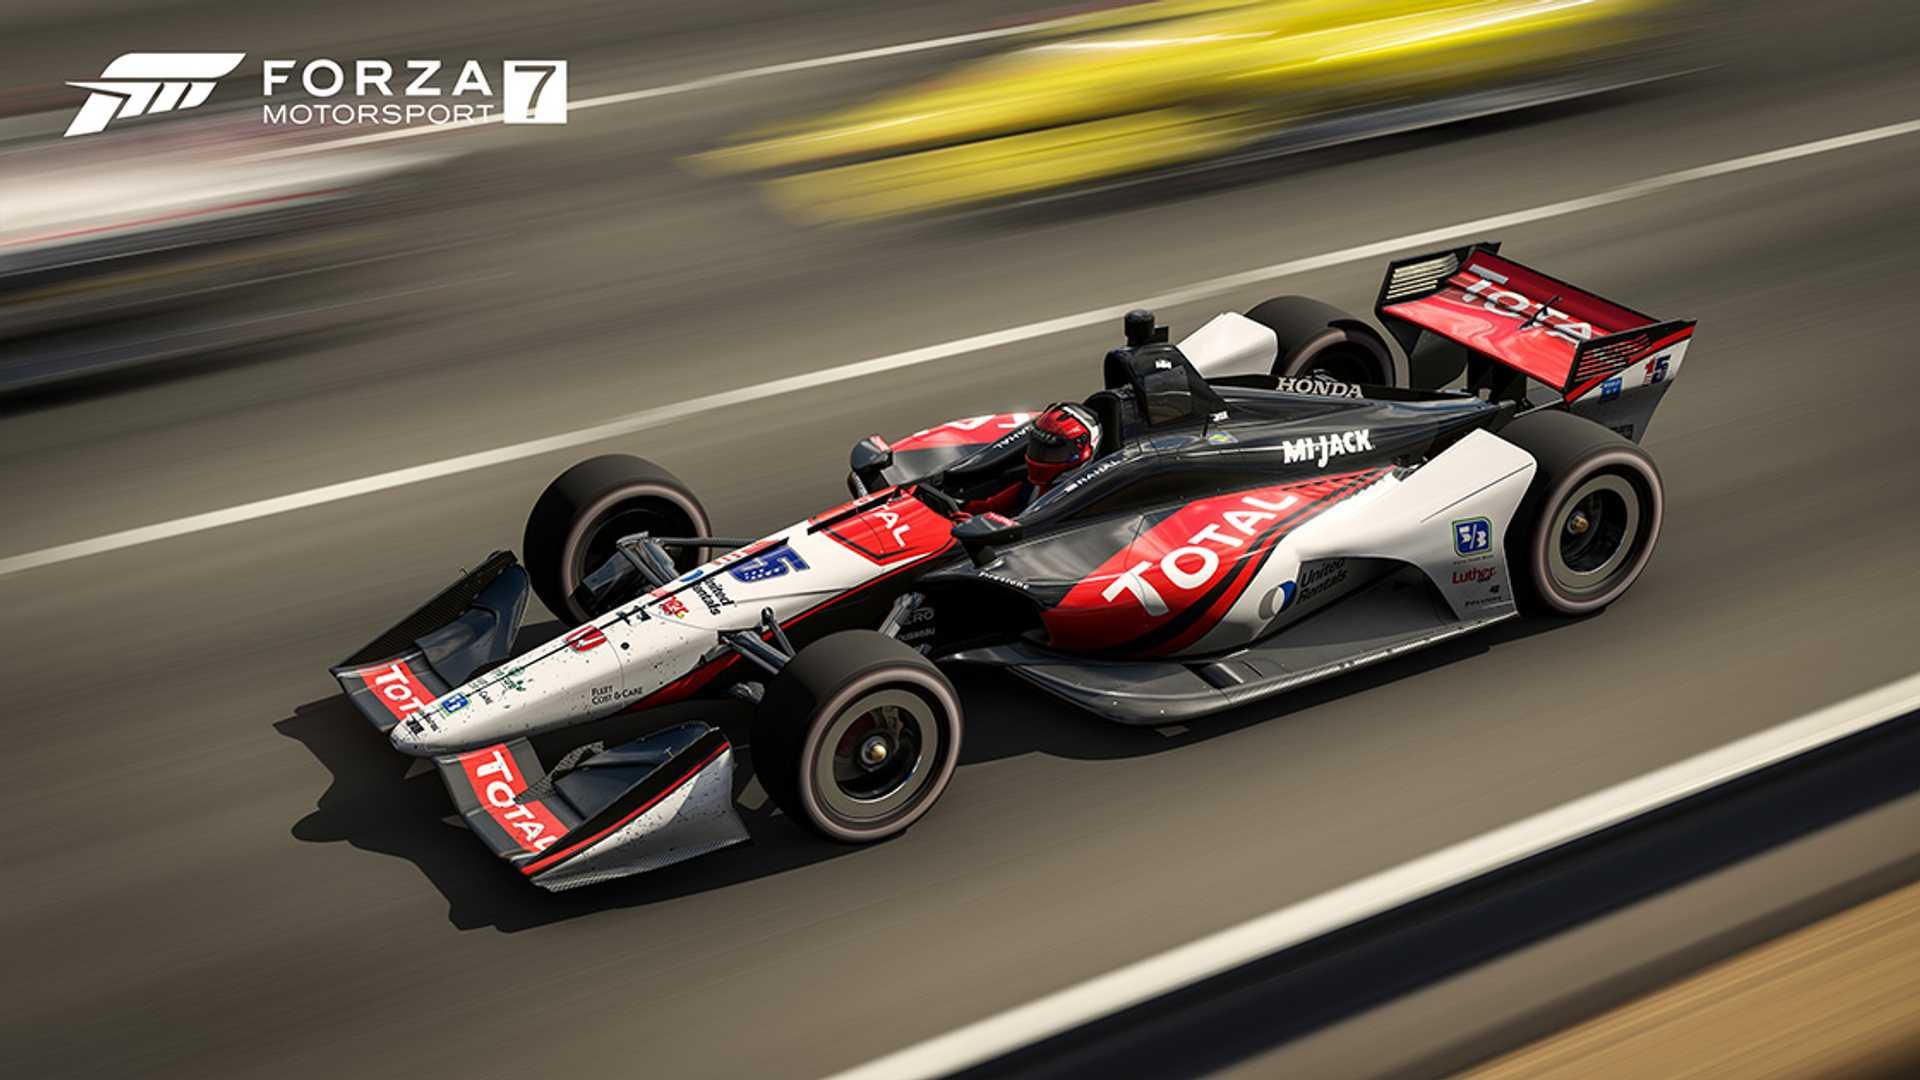 forza-motorsport-7-may-2019-update